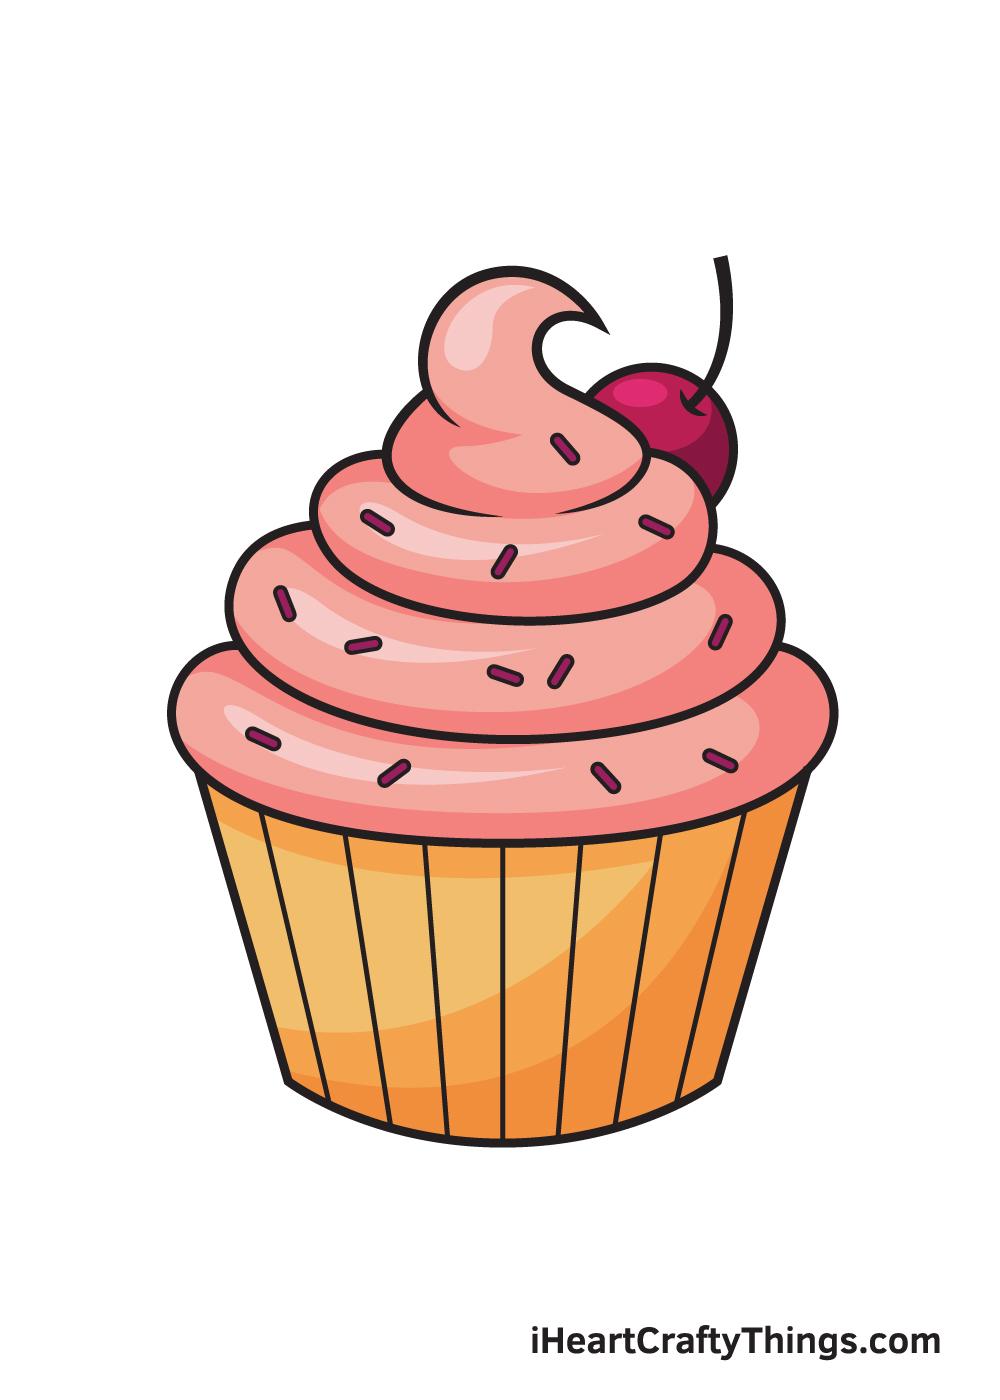 Cupcake Drawing – 9 Steps